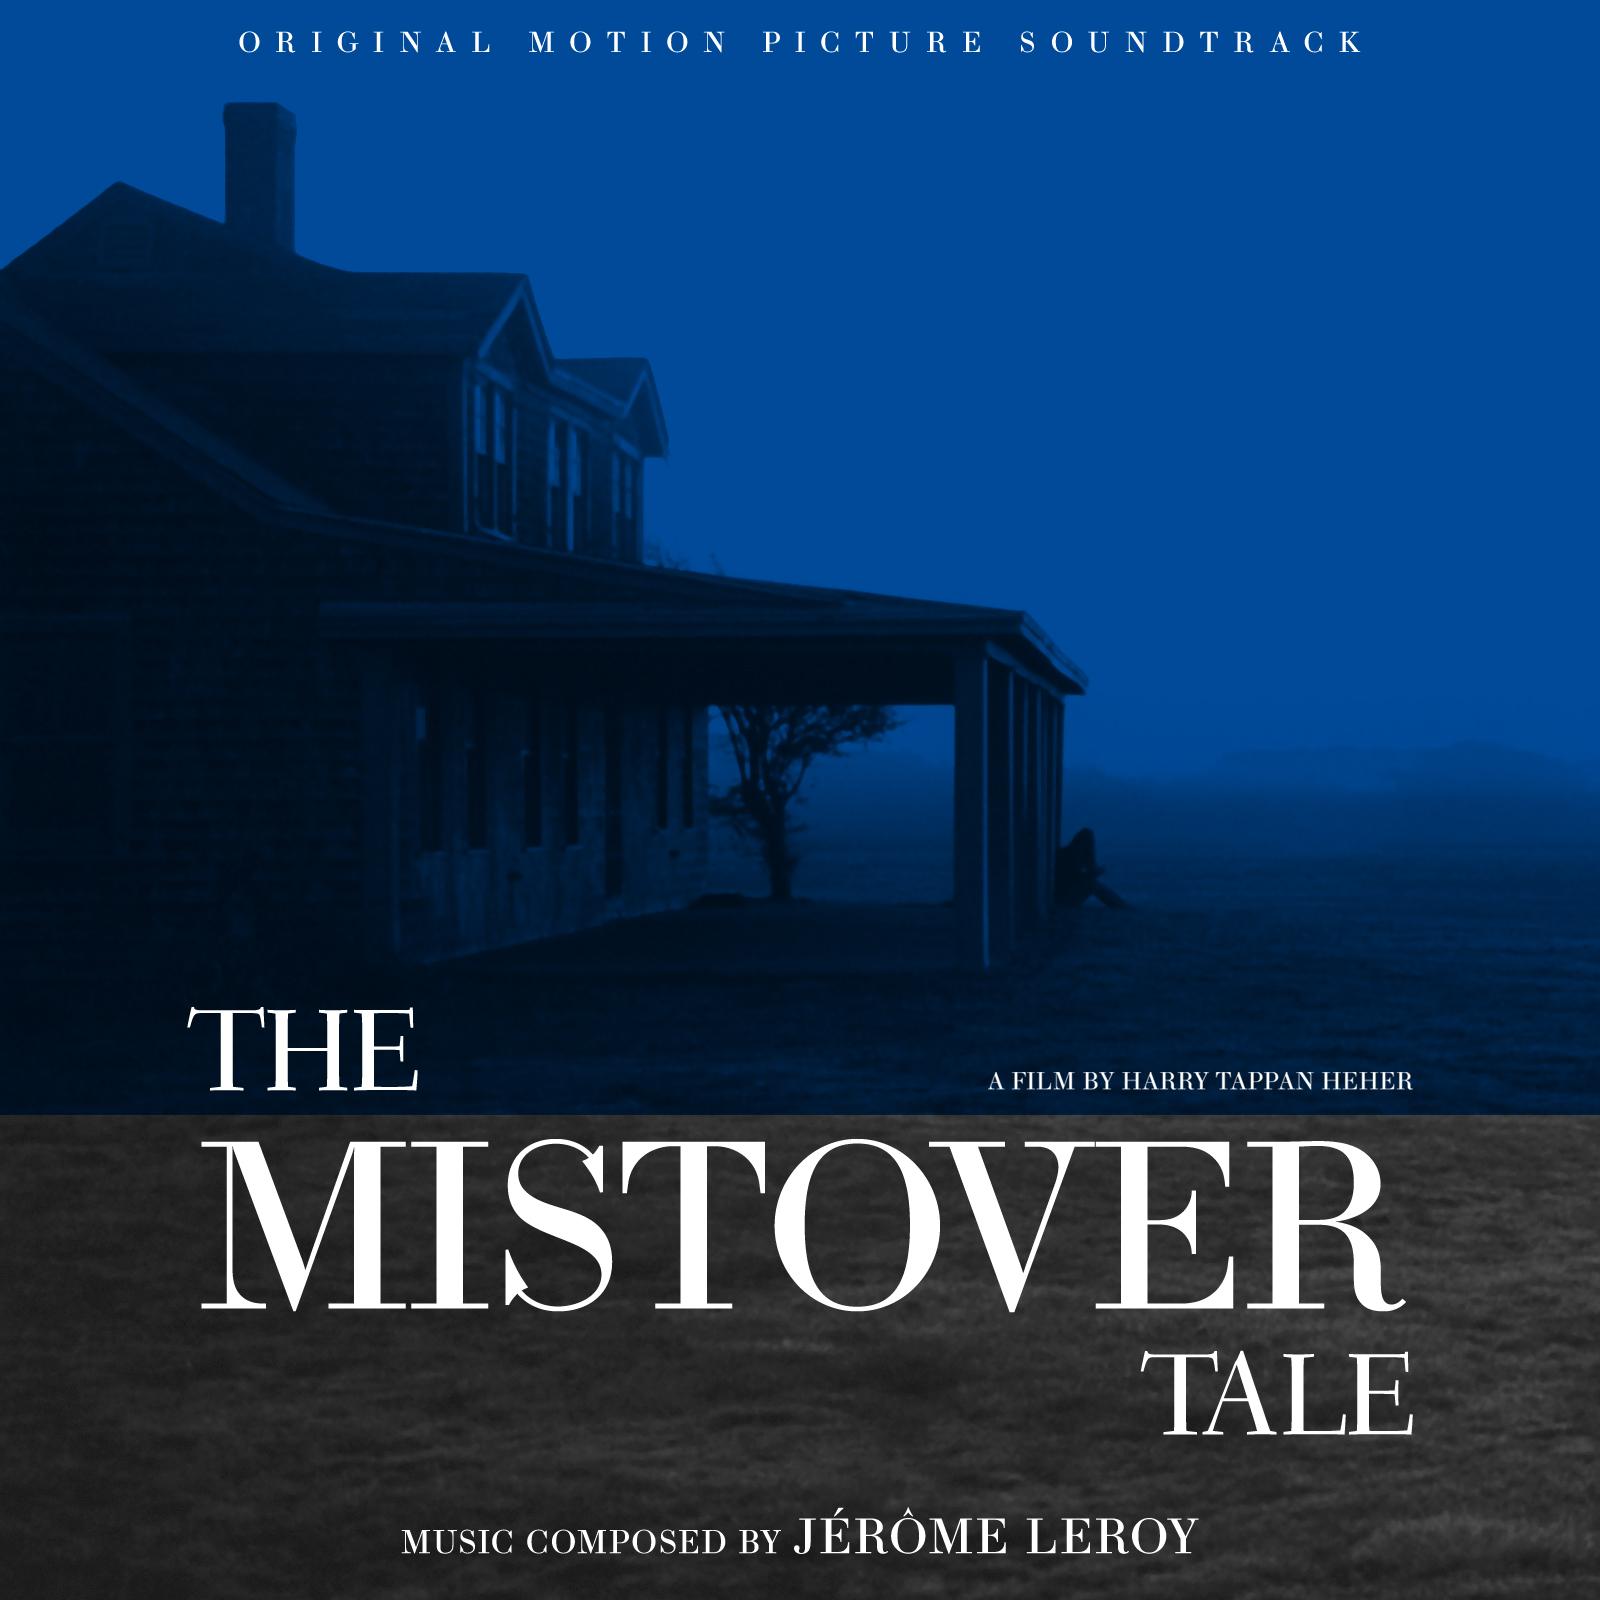 Artwork for THE MISTOVER TALE soundtrack